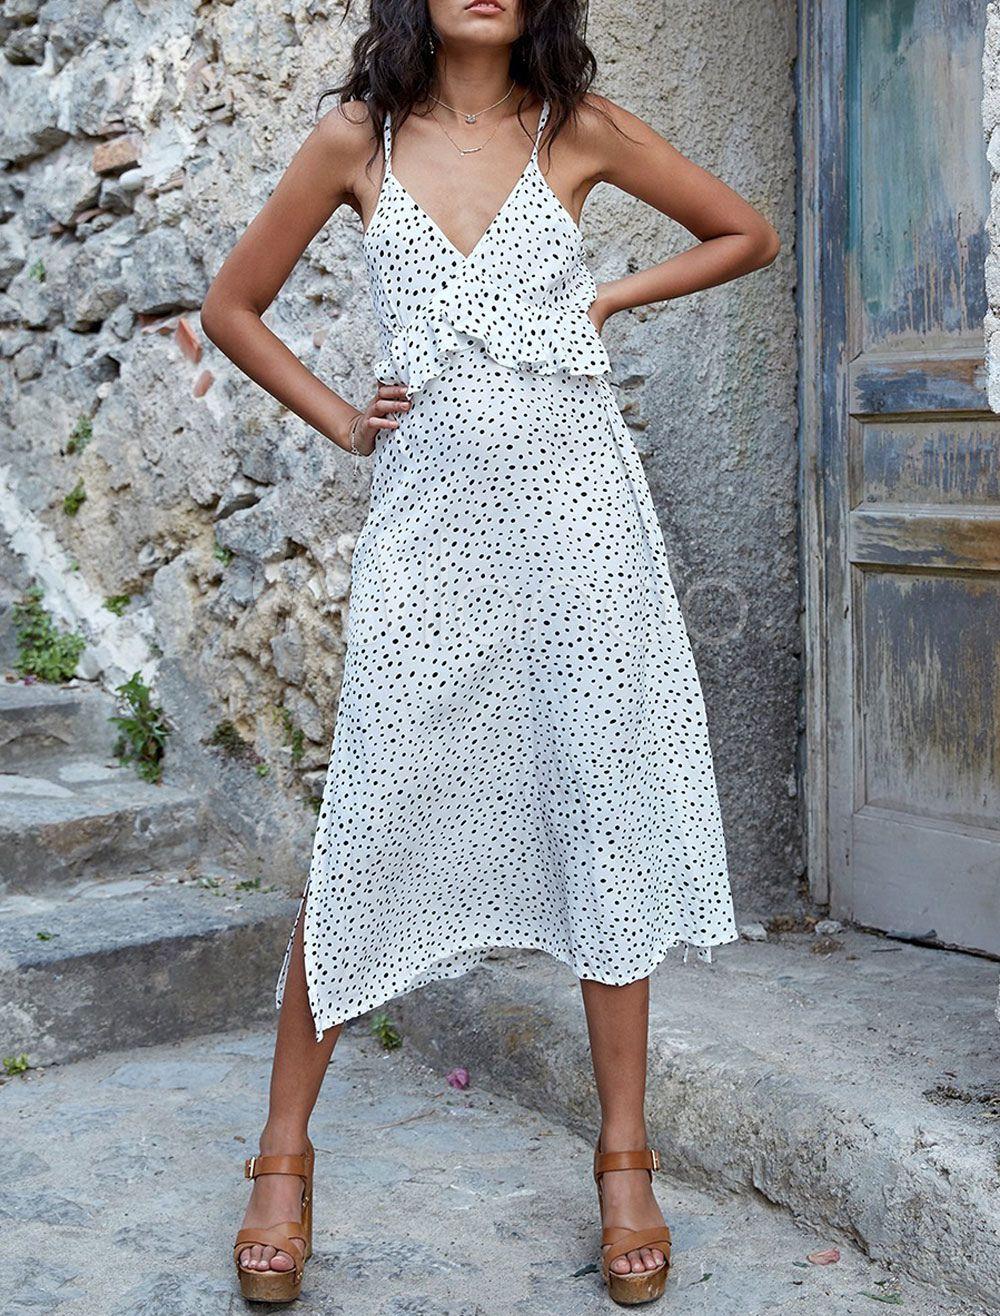 White Summer Dress V Neck Straps Ruffles Polka Dot Long Dress Polka Dot Long Dresses Bohemian Maxi Dress Summer Dress Outfits [ 1316 x 1000 Pixel ]